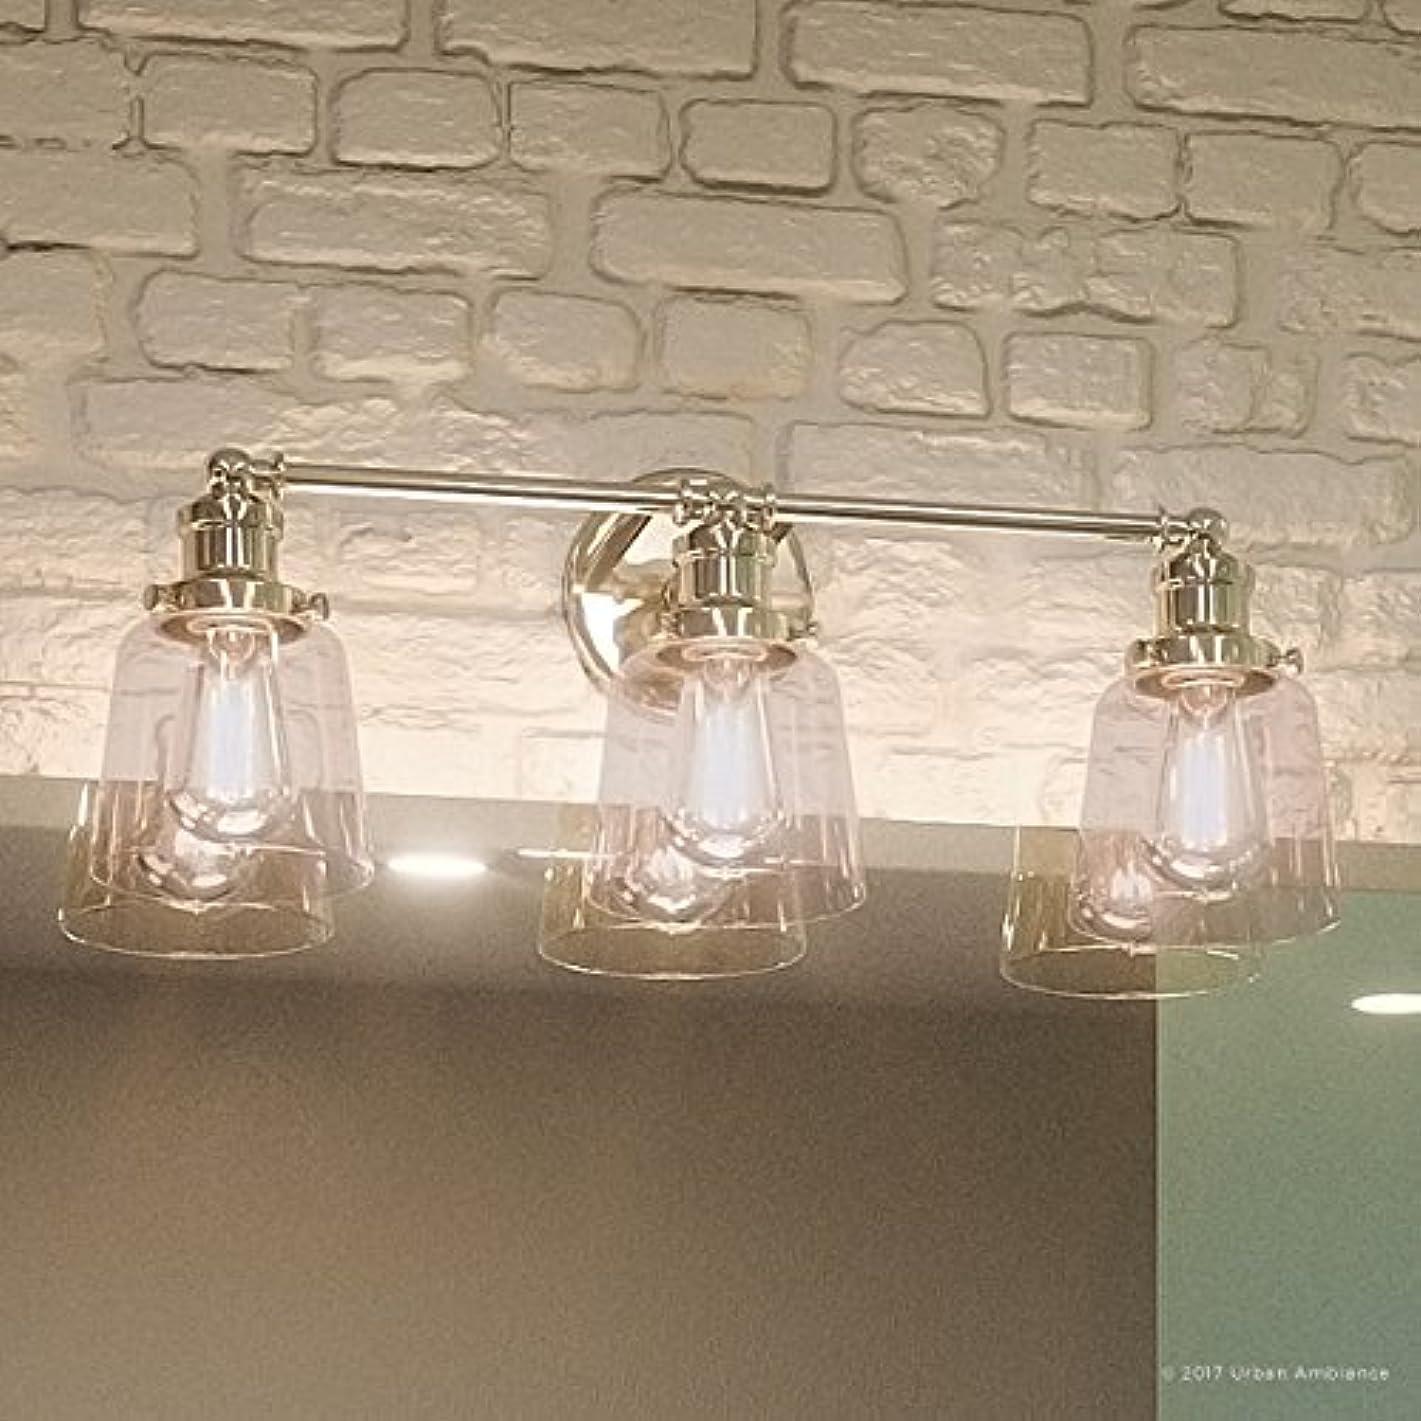 Luxury Industrial Chic Bathroom Vanity Light, Medium Size: 9